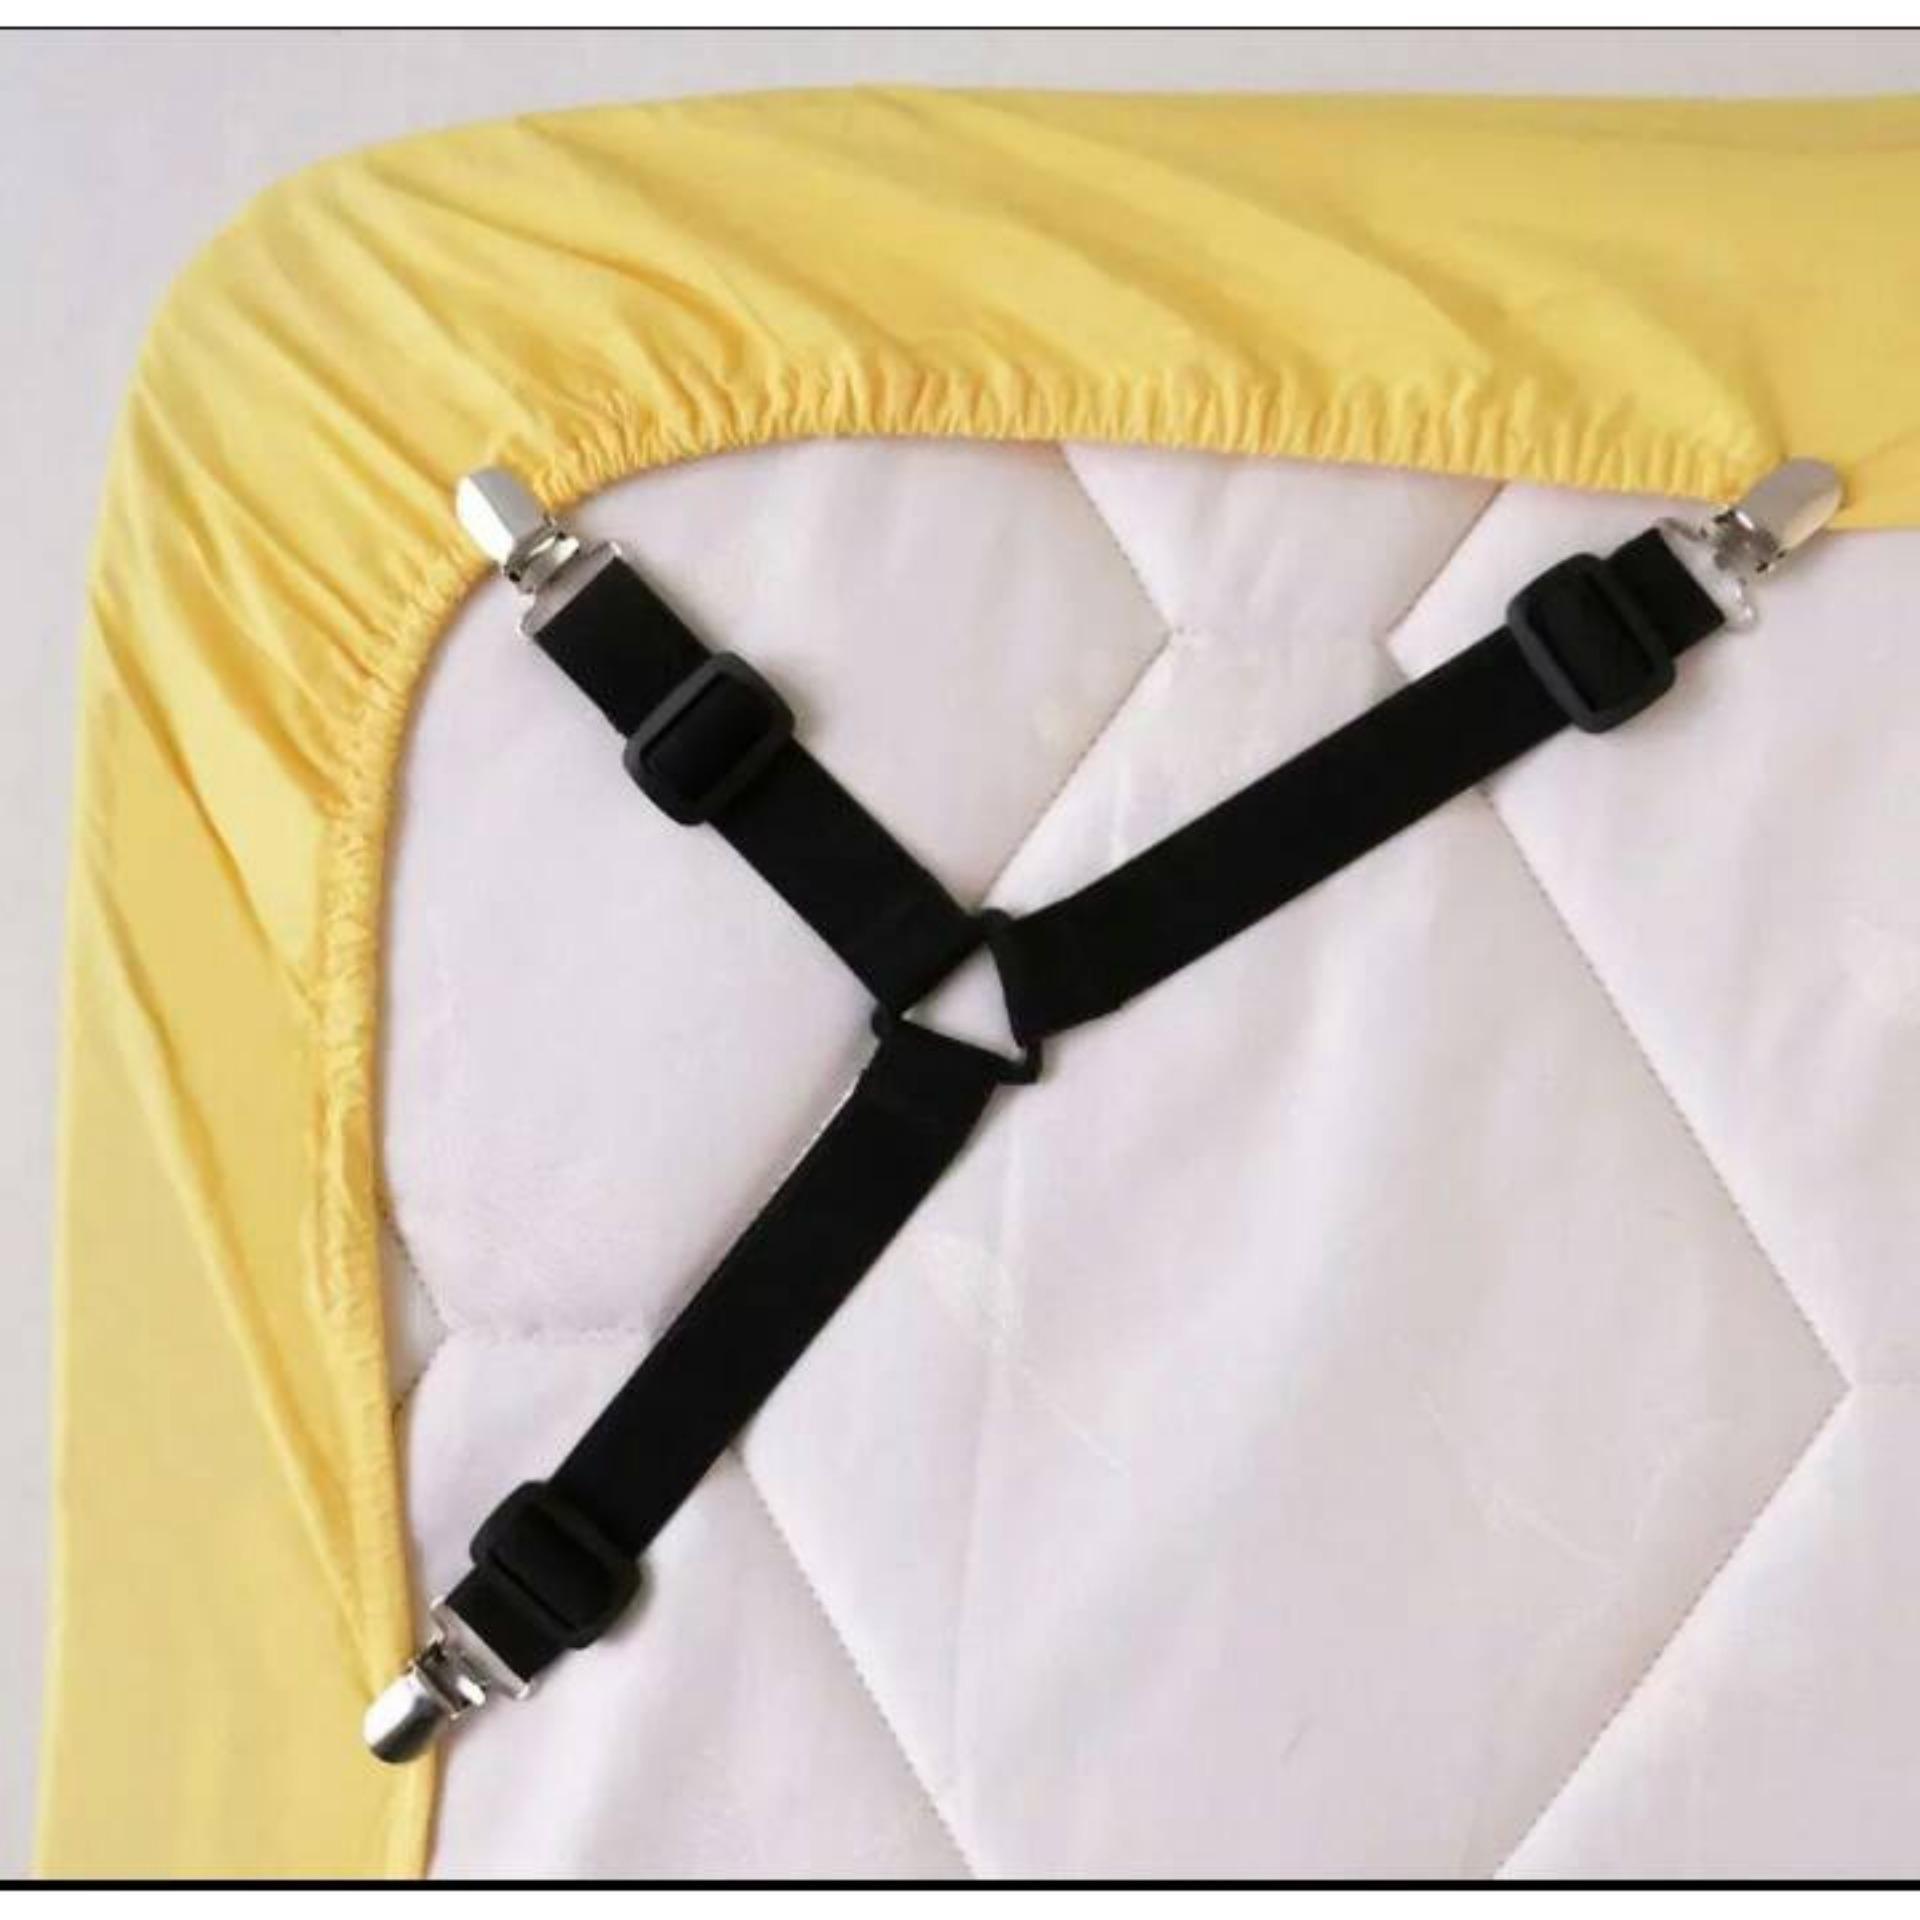 Penjepit Sprei Bed Sheet Grips - 1 Set